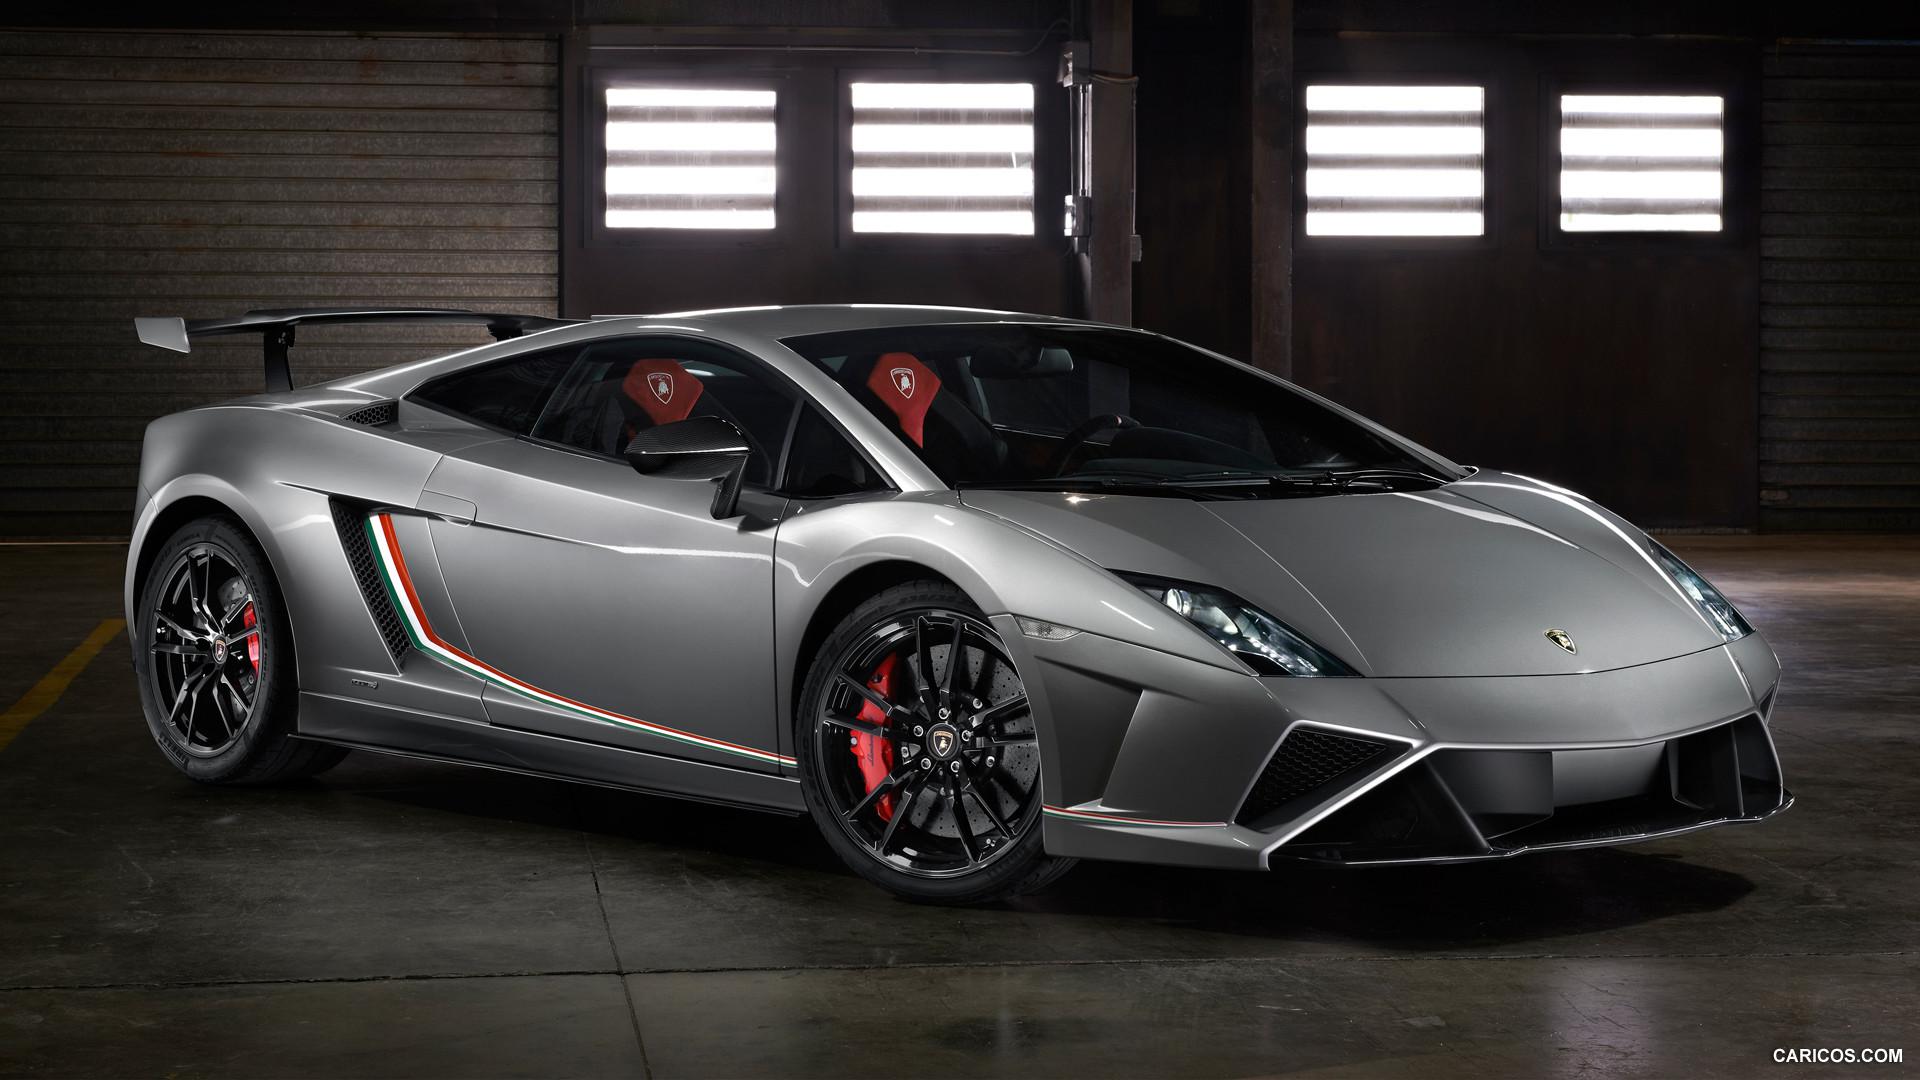 Lamborghini Gallardo Wallpaper 75 Images